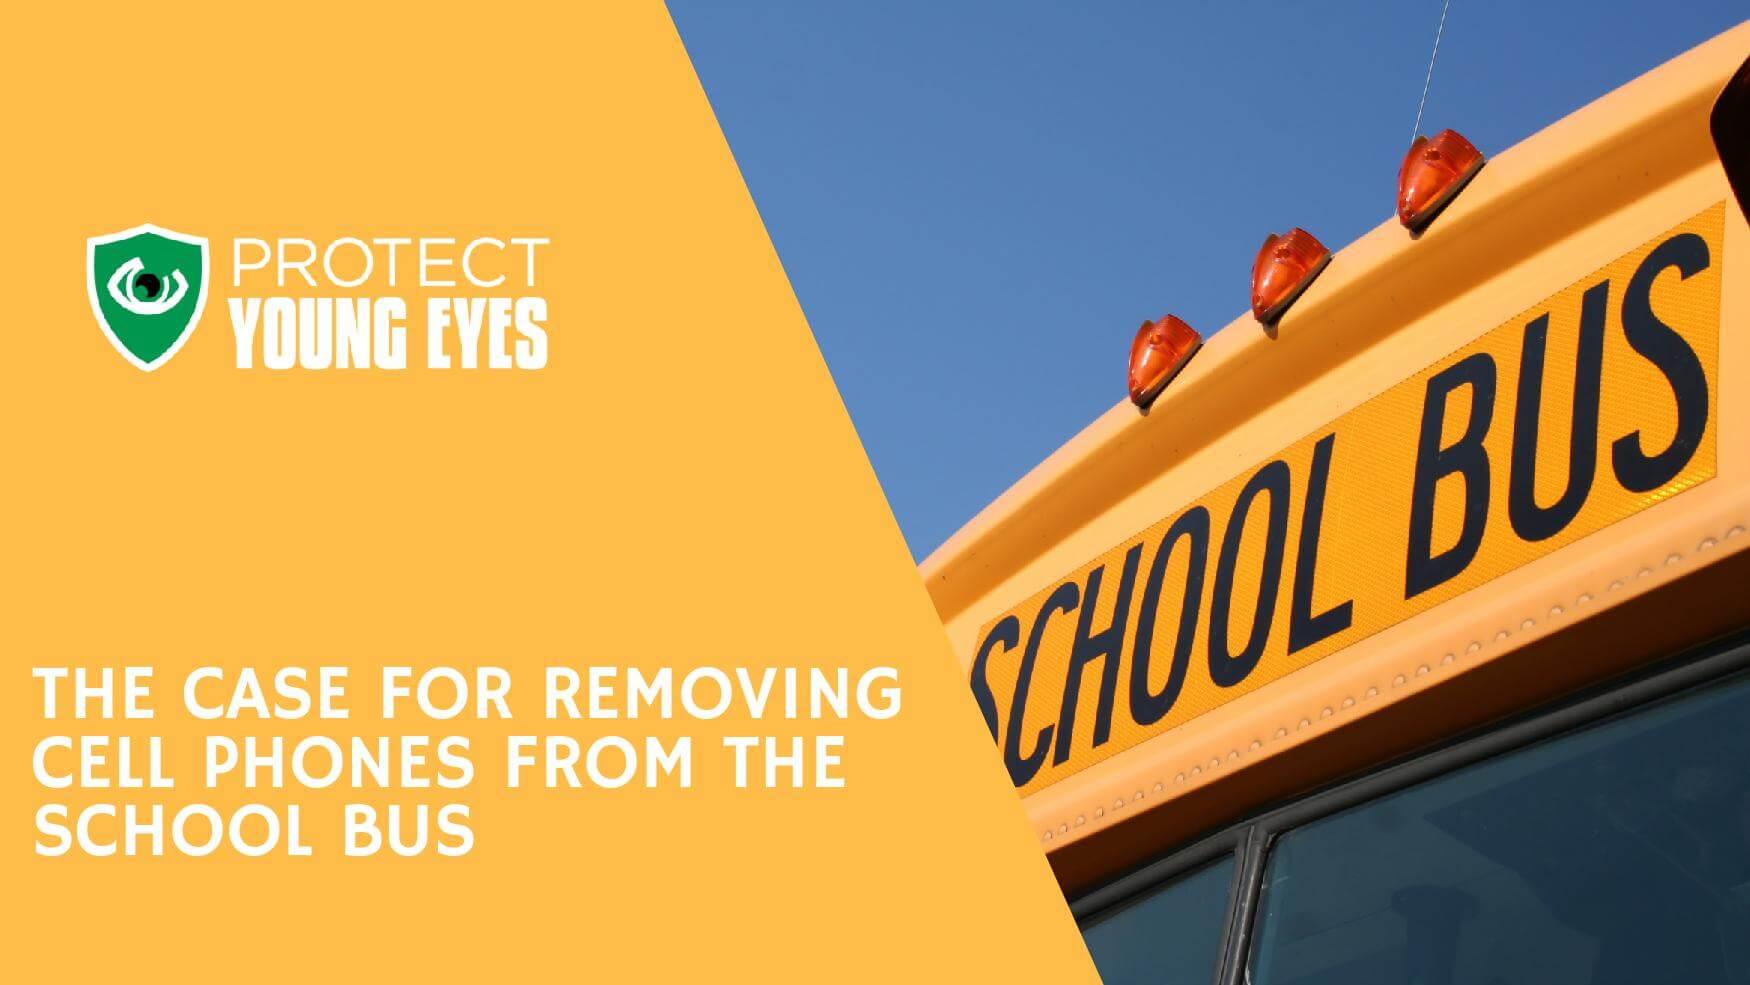 Remove Phones School Bus